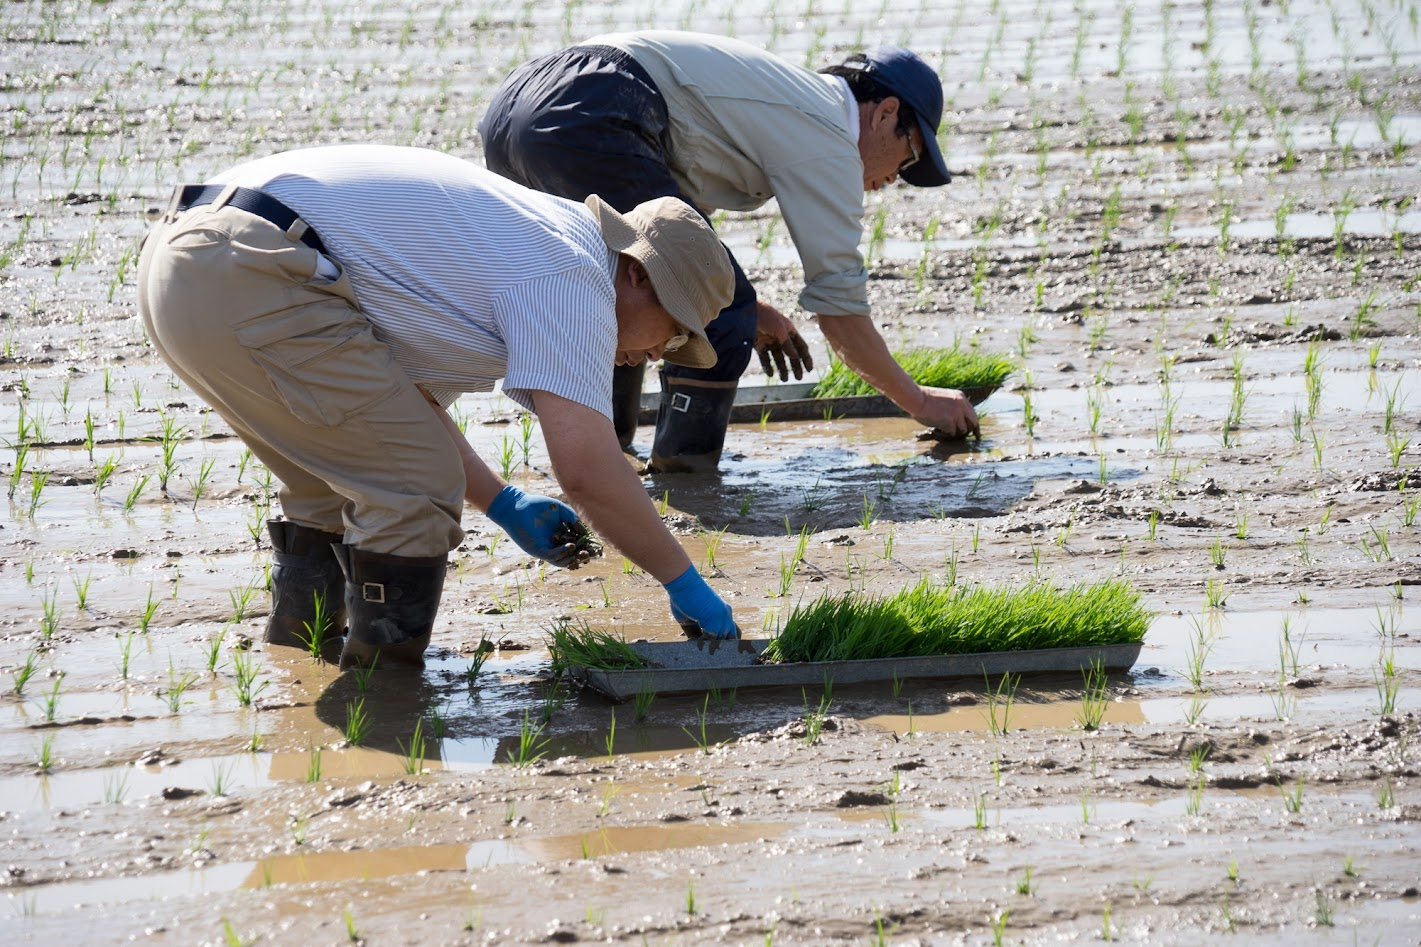 【No.10】空知農業改良普及センターの水稲生育調査の苗植え